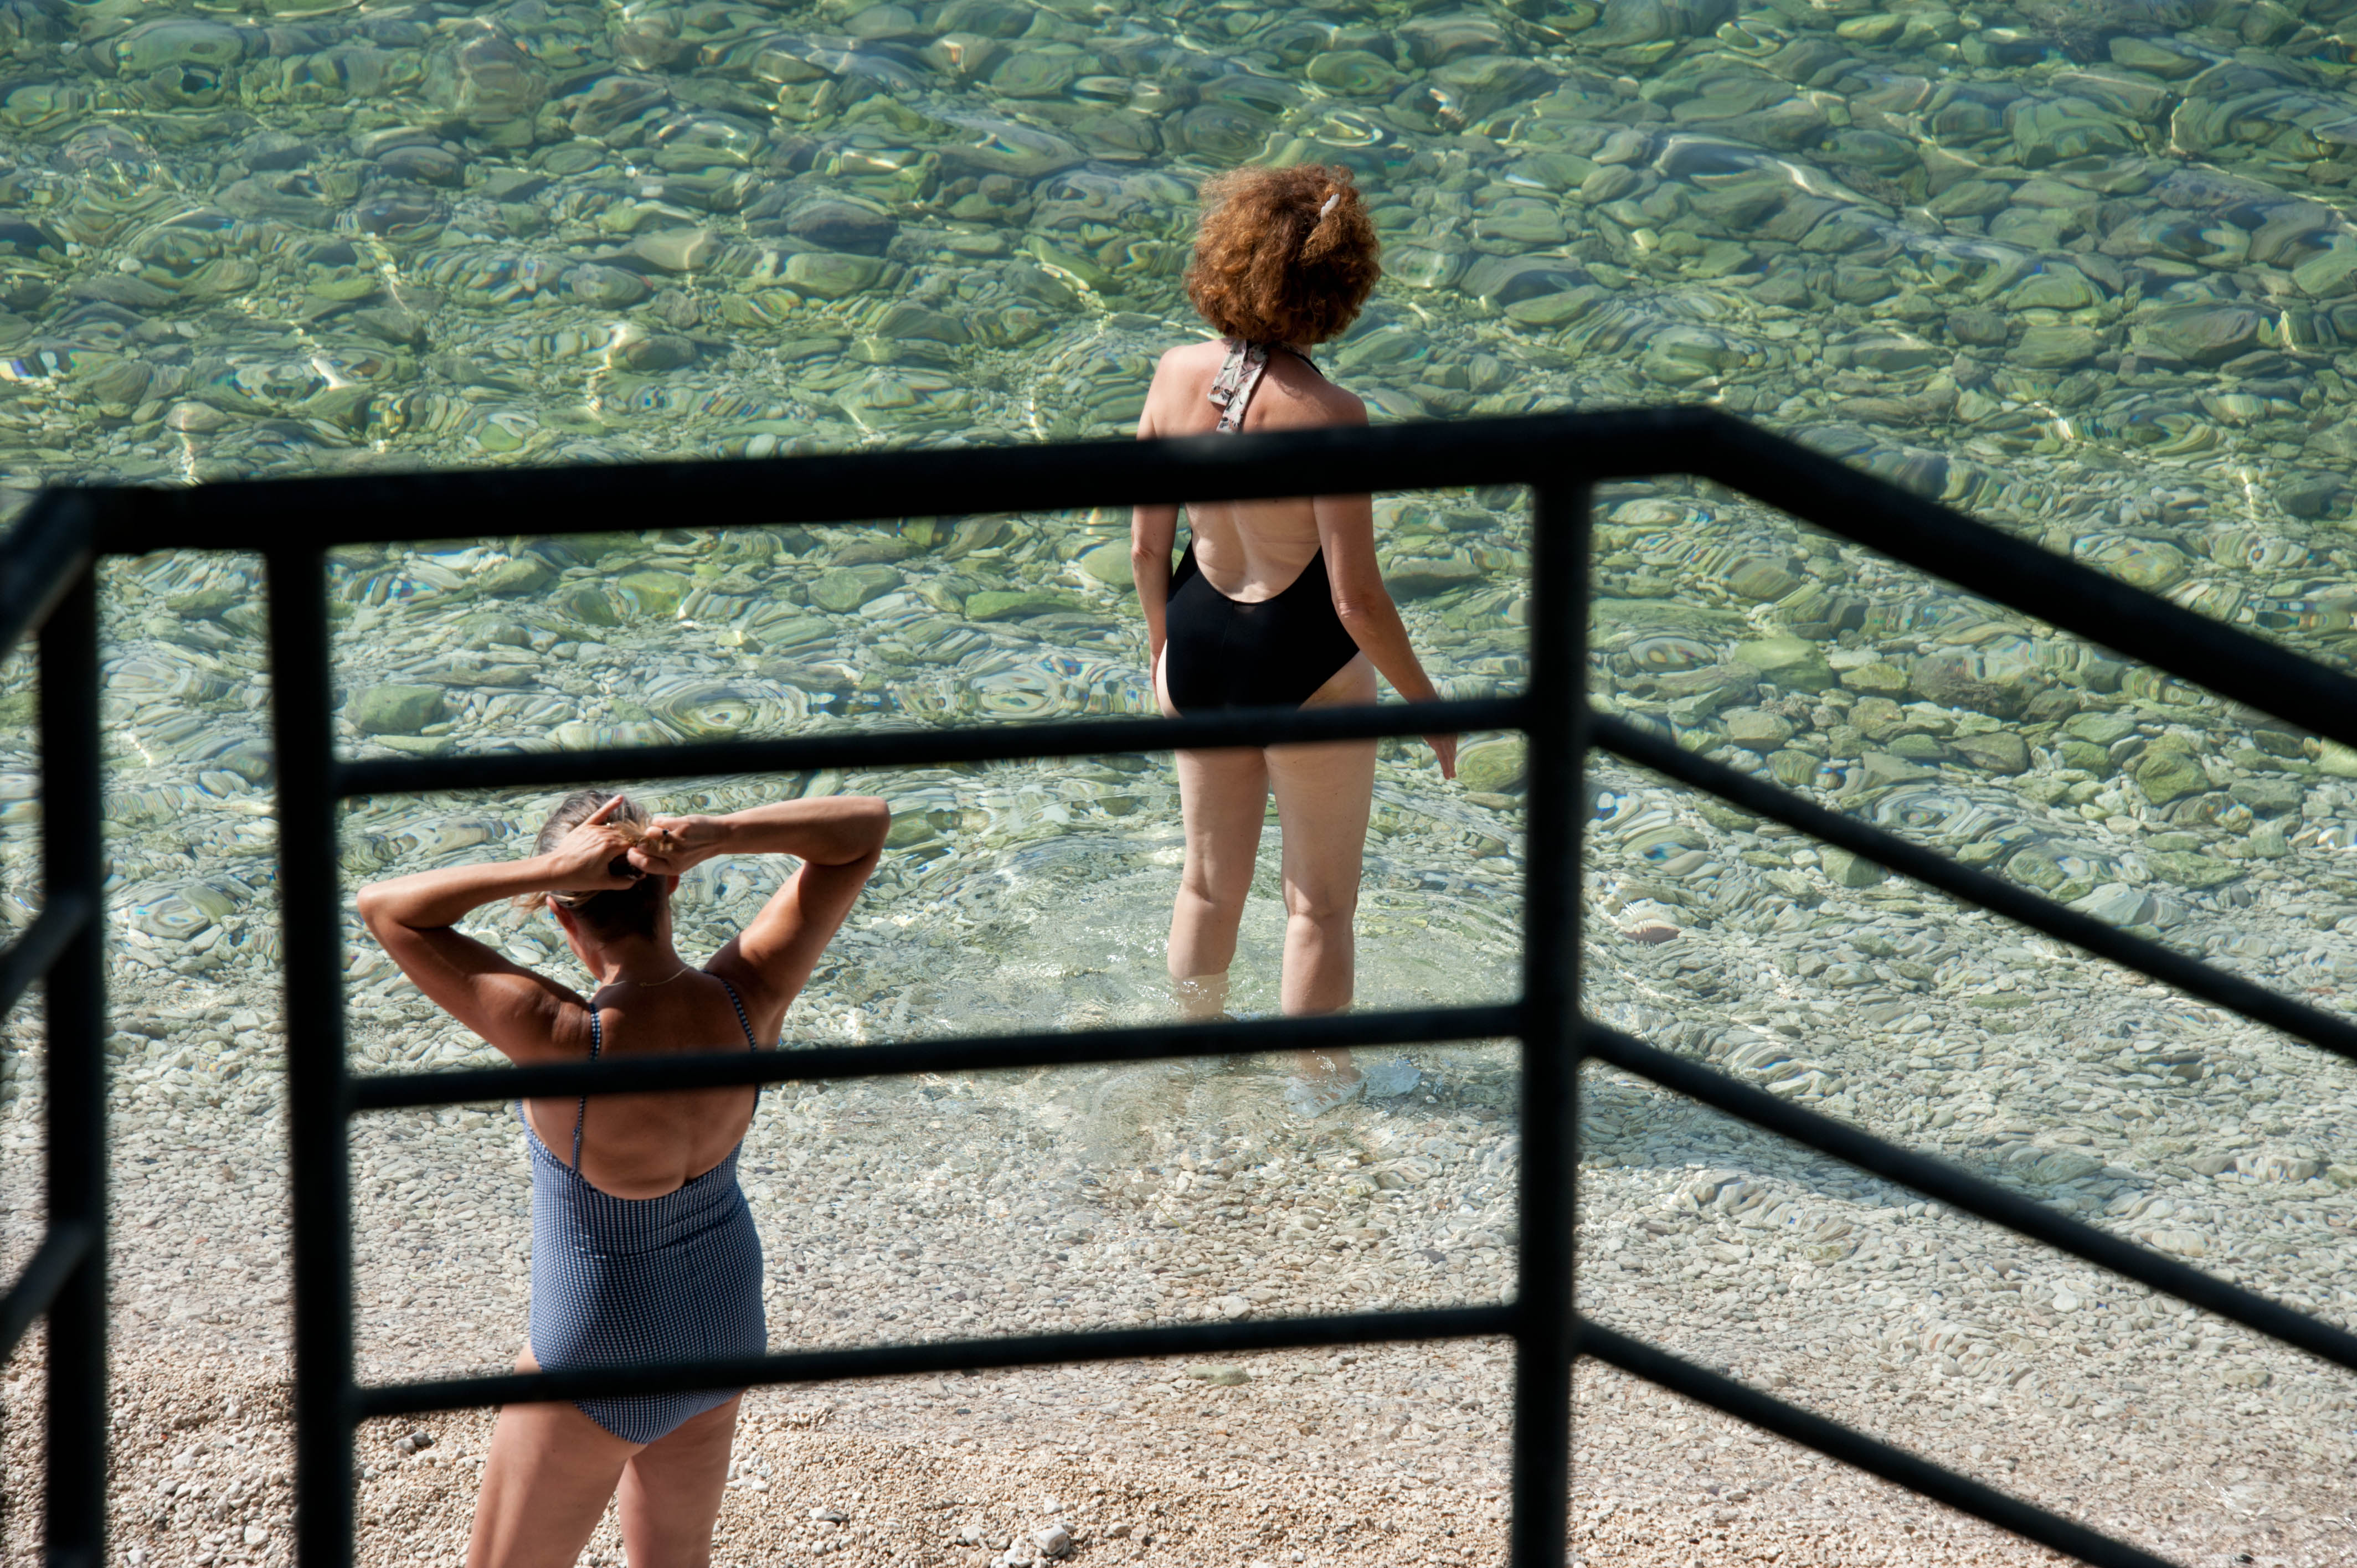 0301-Zaotrog (Dalmatie centrale)